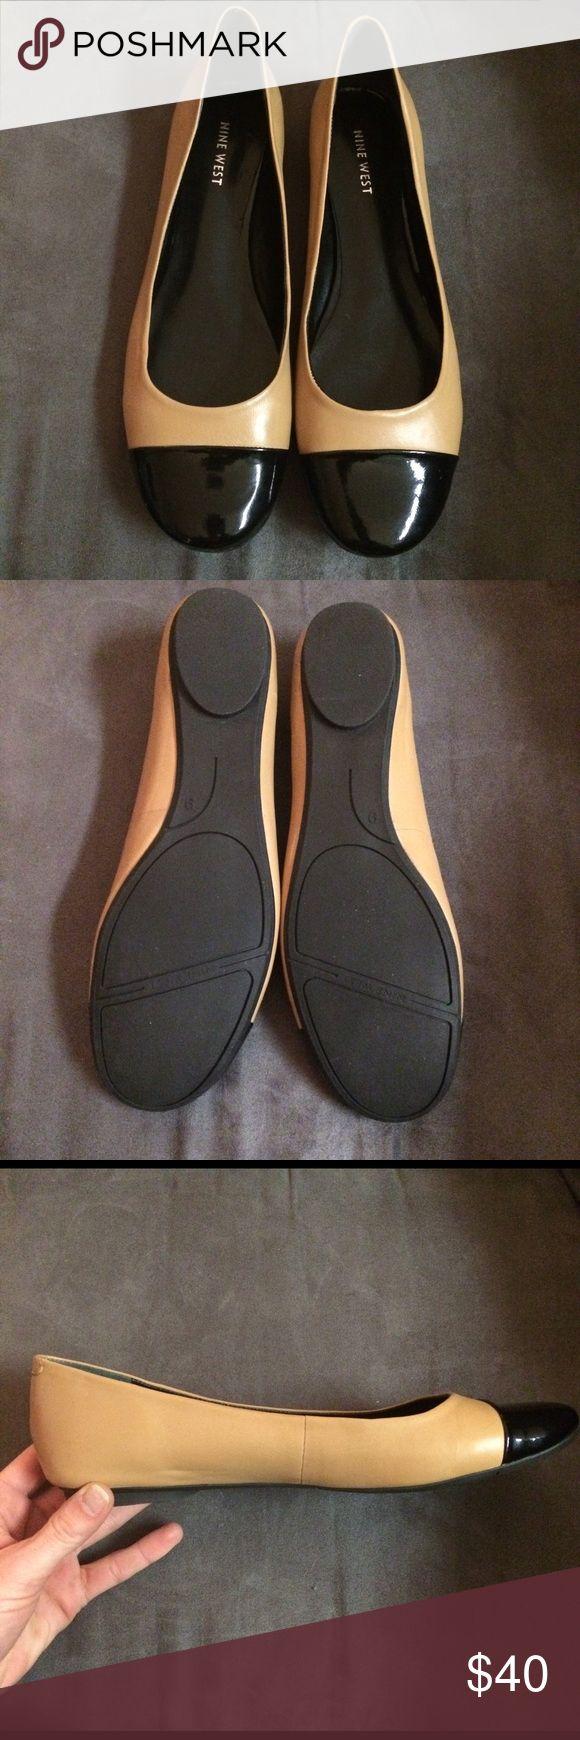 Nine West Nolady Bella Tan & Black Leather Flat ✨NWOT✨ Matte tan leather with shiny black leather rounded toe. Slightly cushioned. Size 9 medium width. Nine West Shoes Flats & Loafers